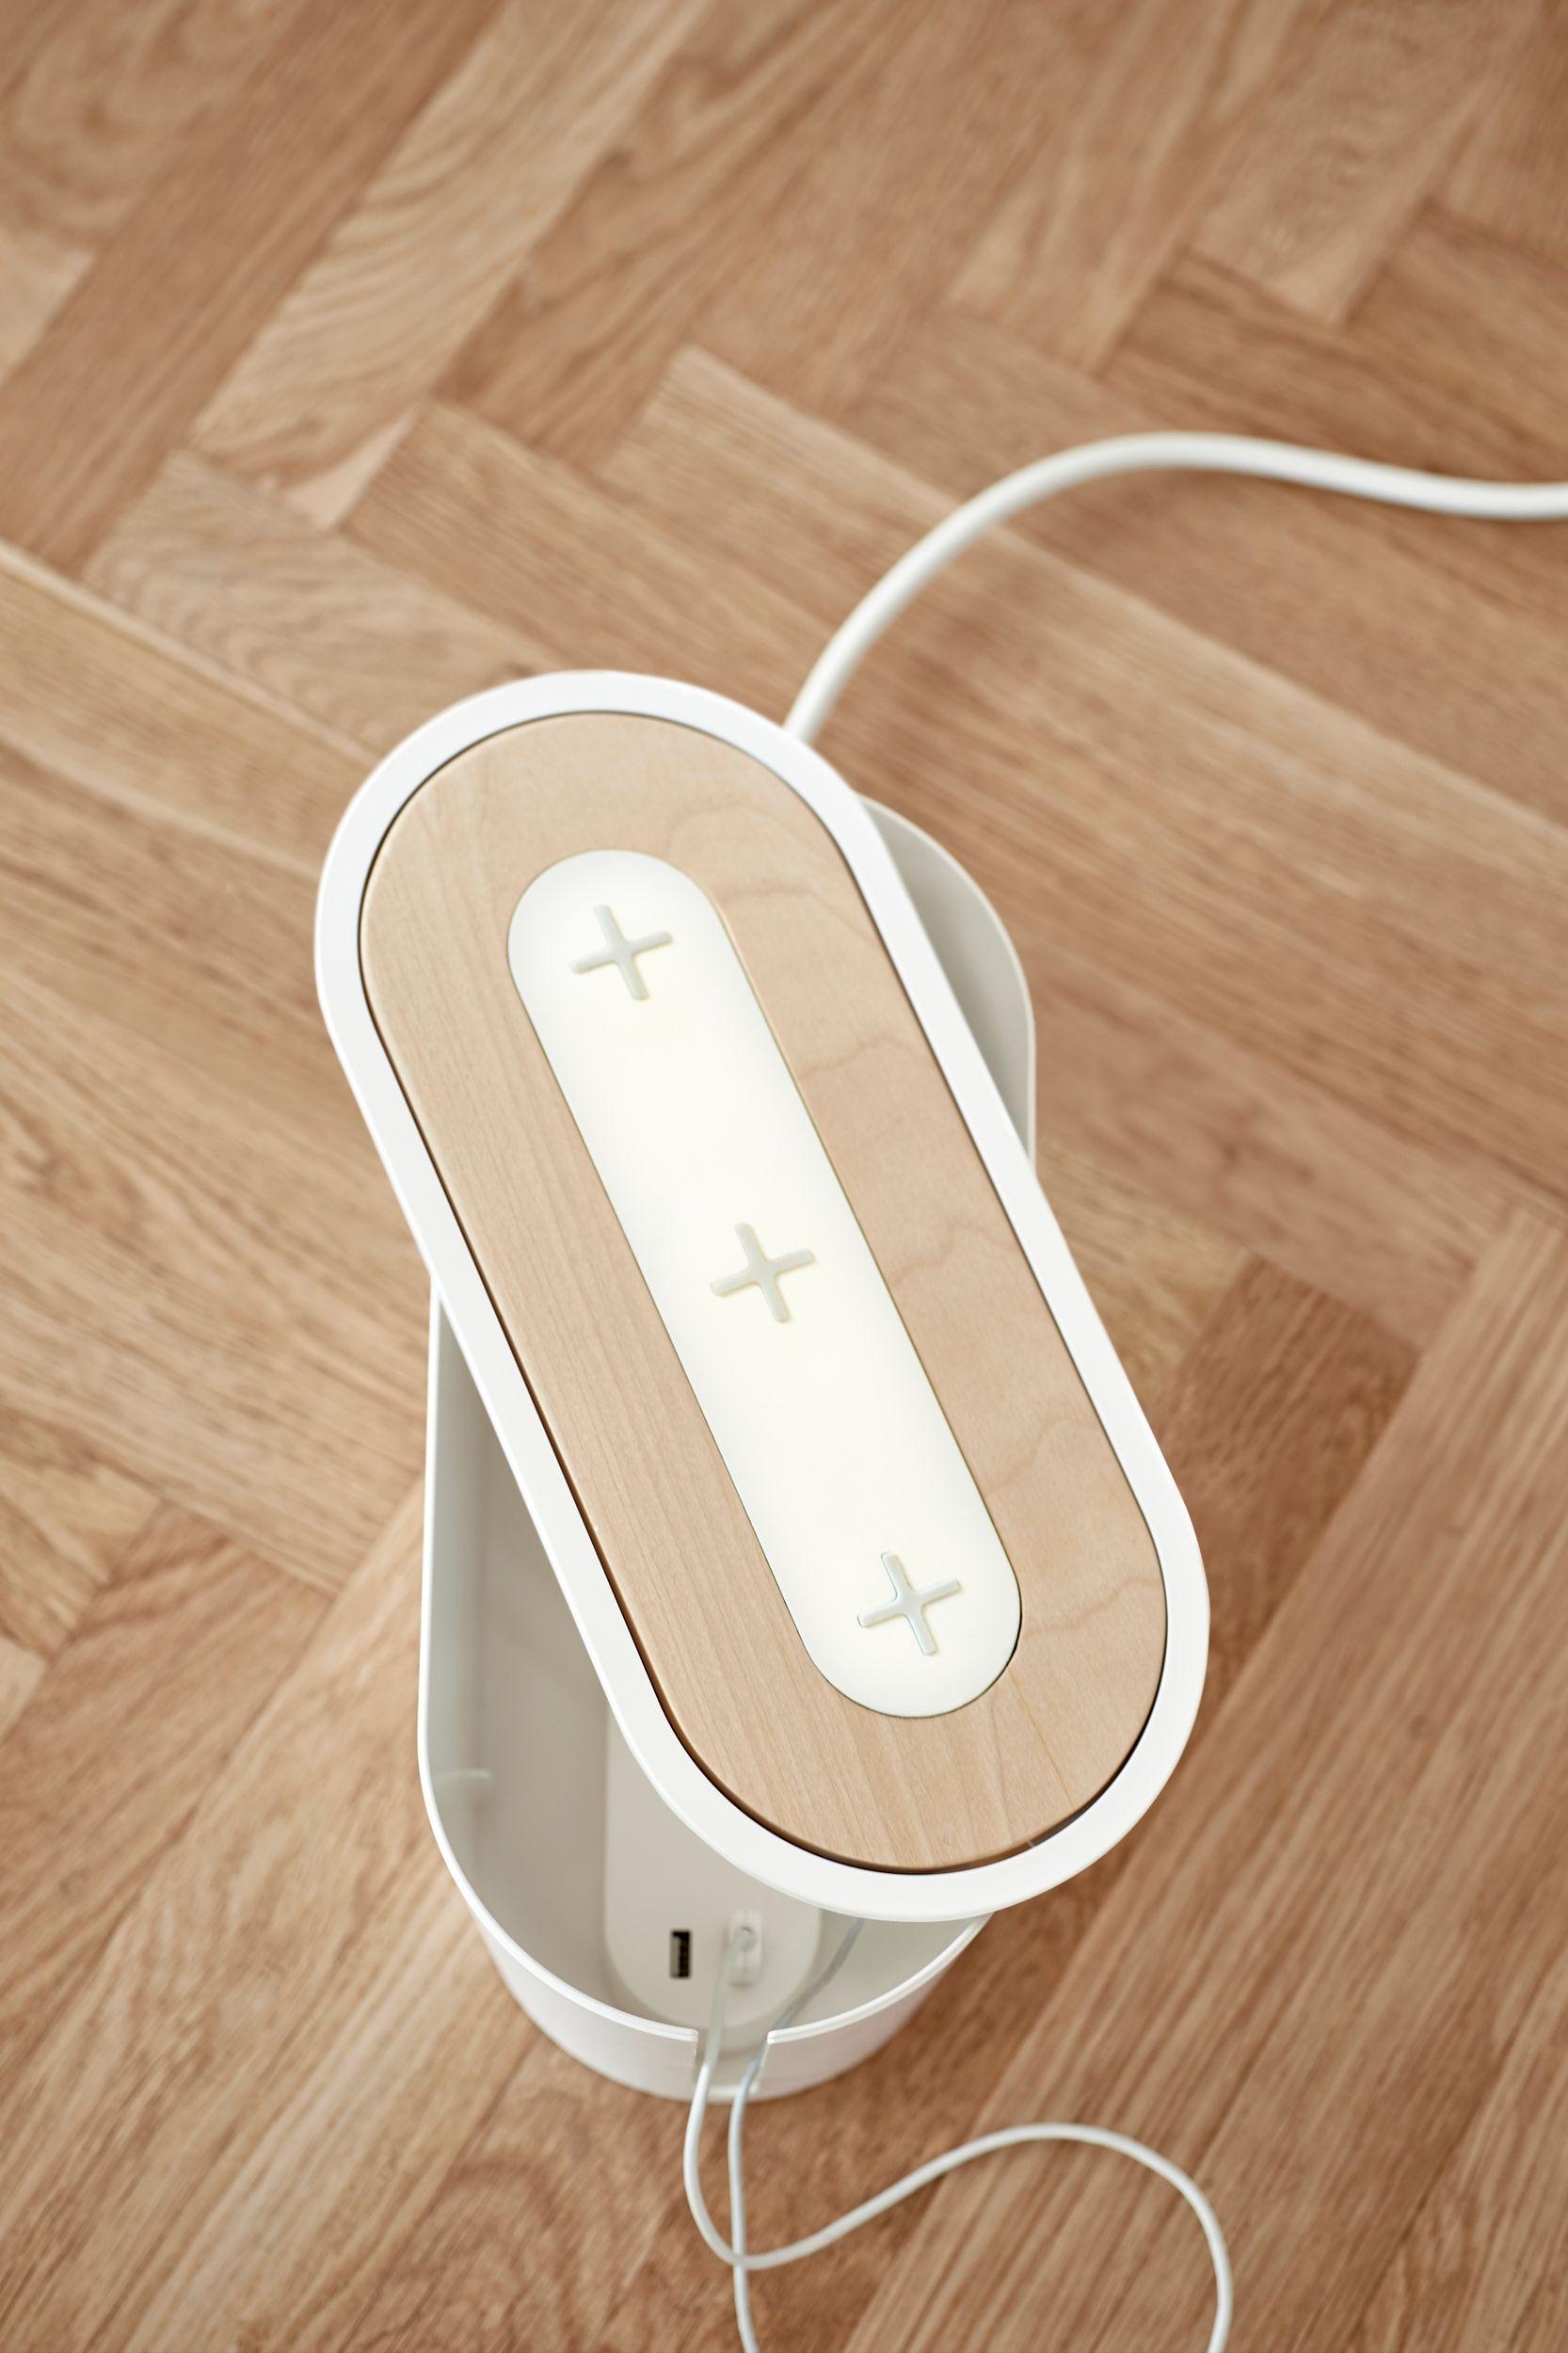 ikea-wireless-charging-5